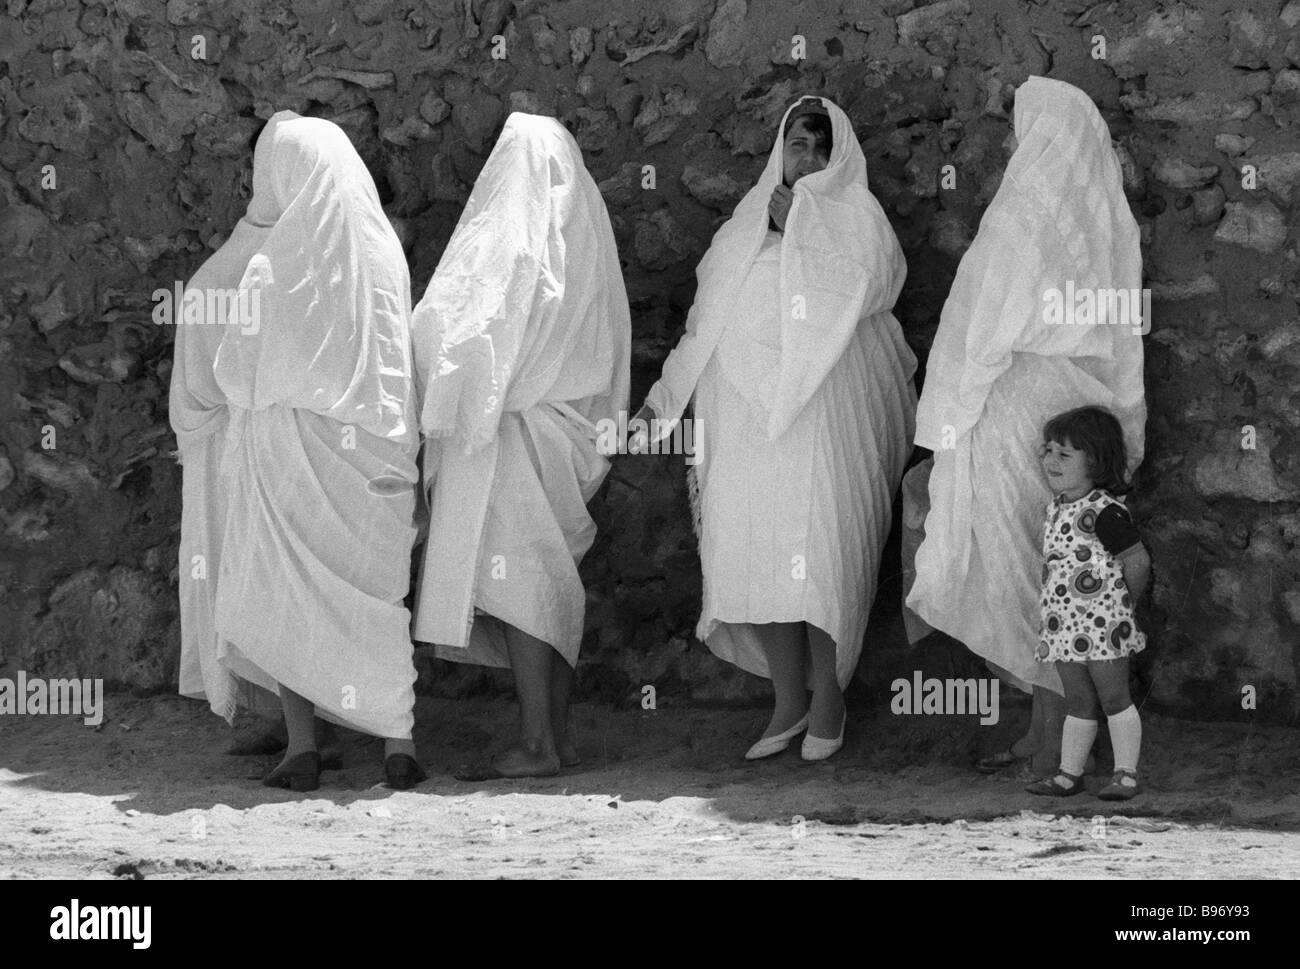 Tunisian women in national dress - Stock Image